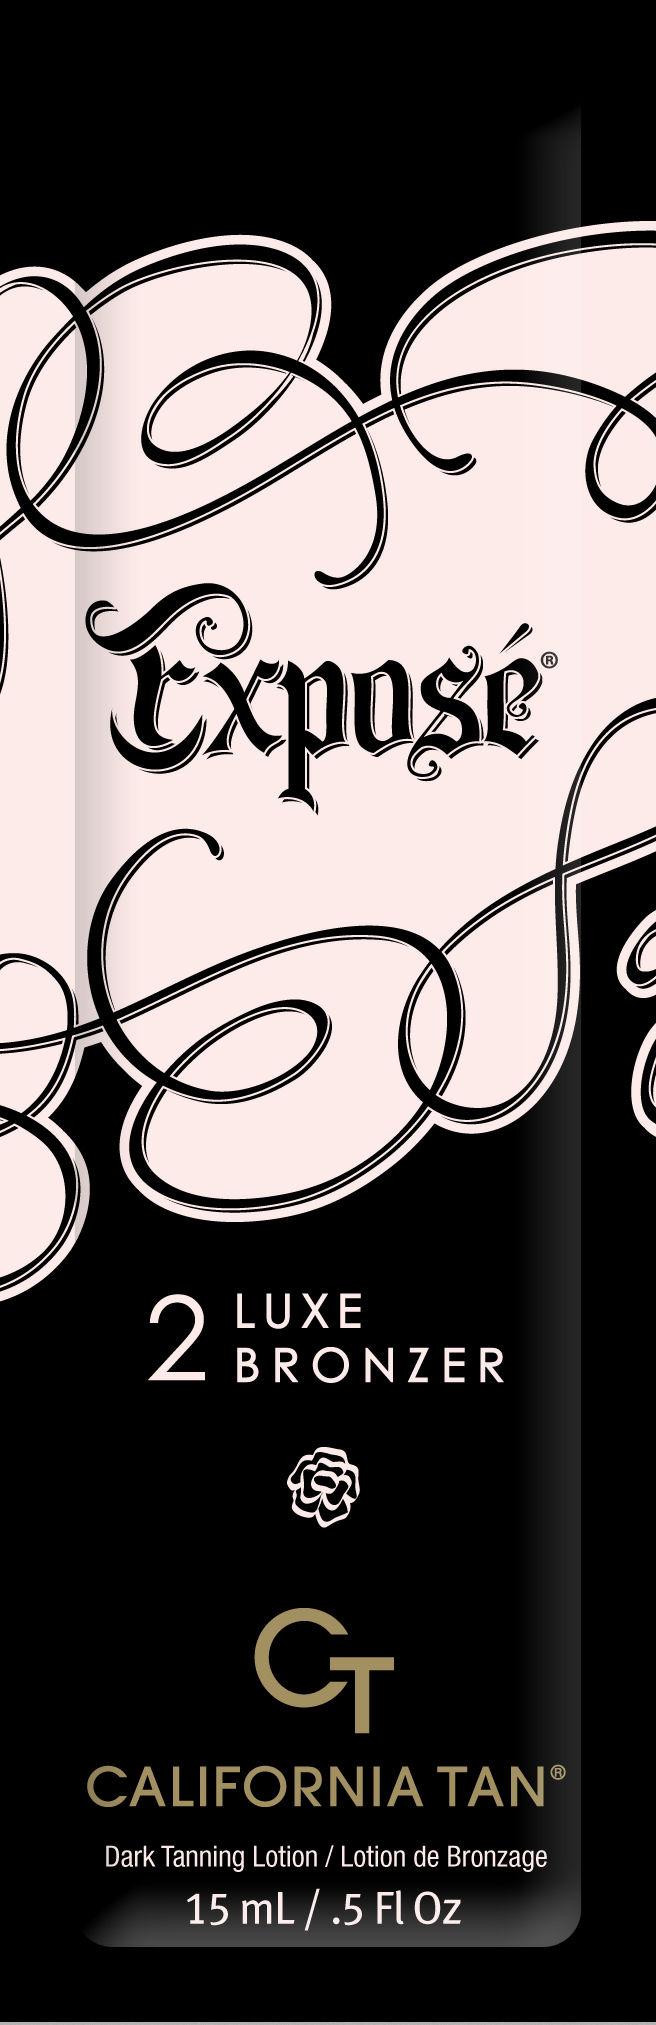 Exposé® Luxe Bronzer Step 2 Pkt